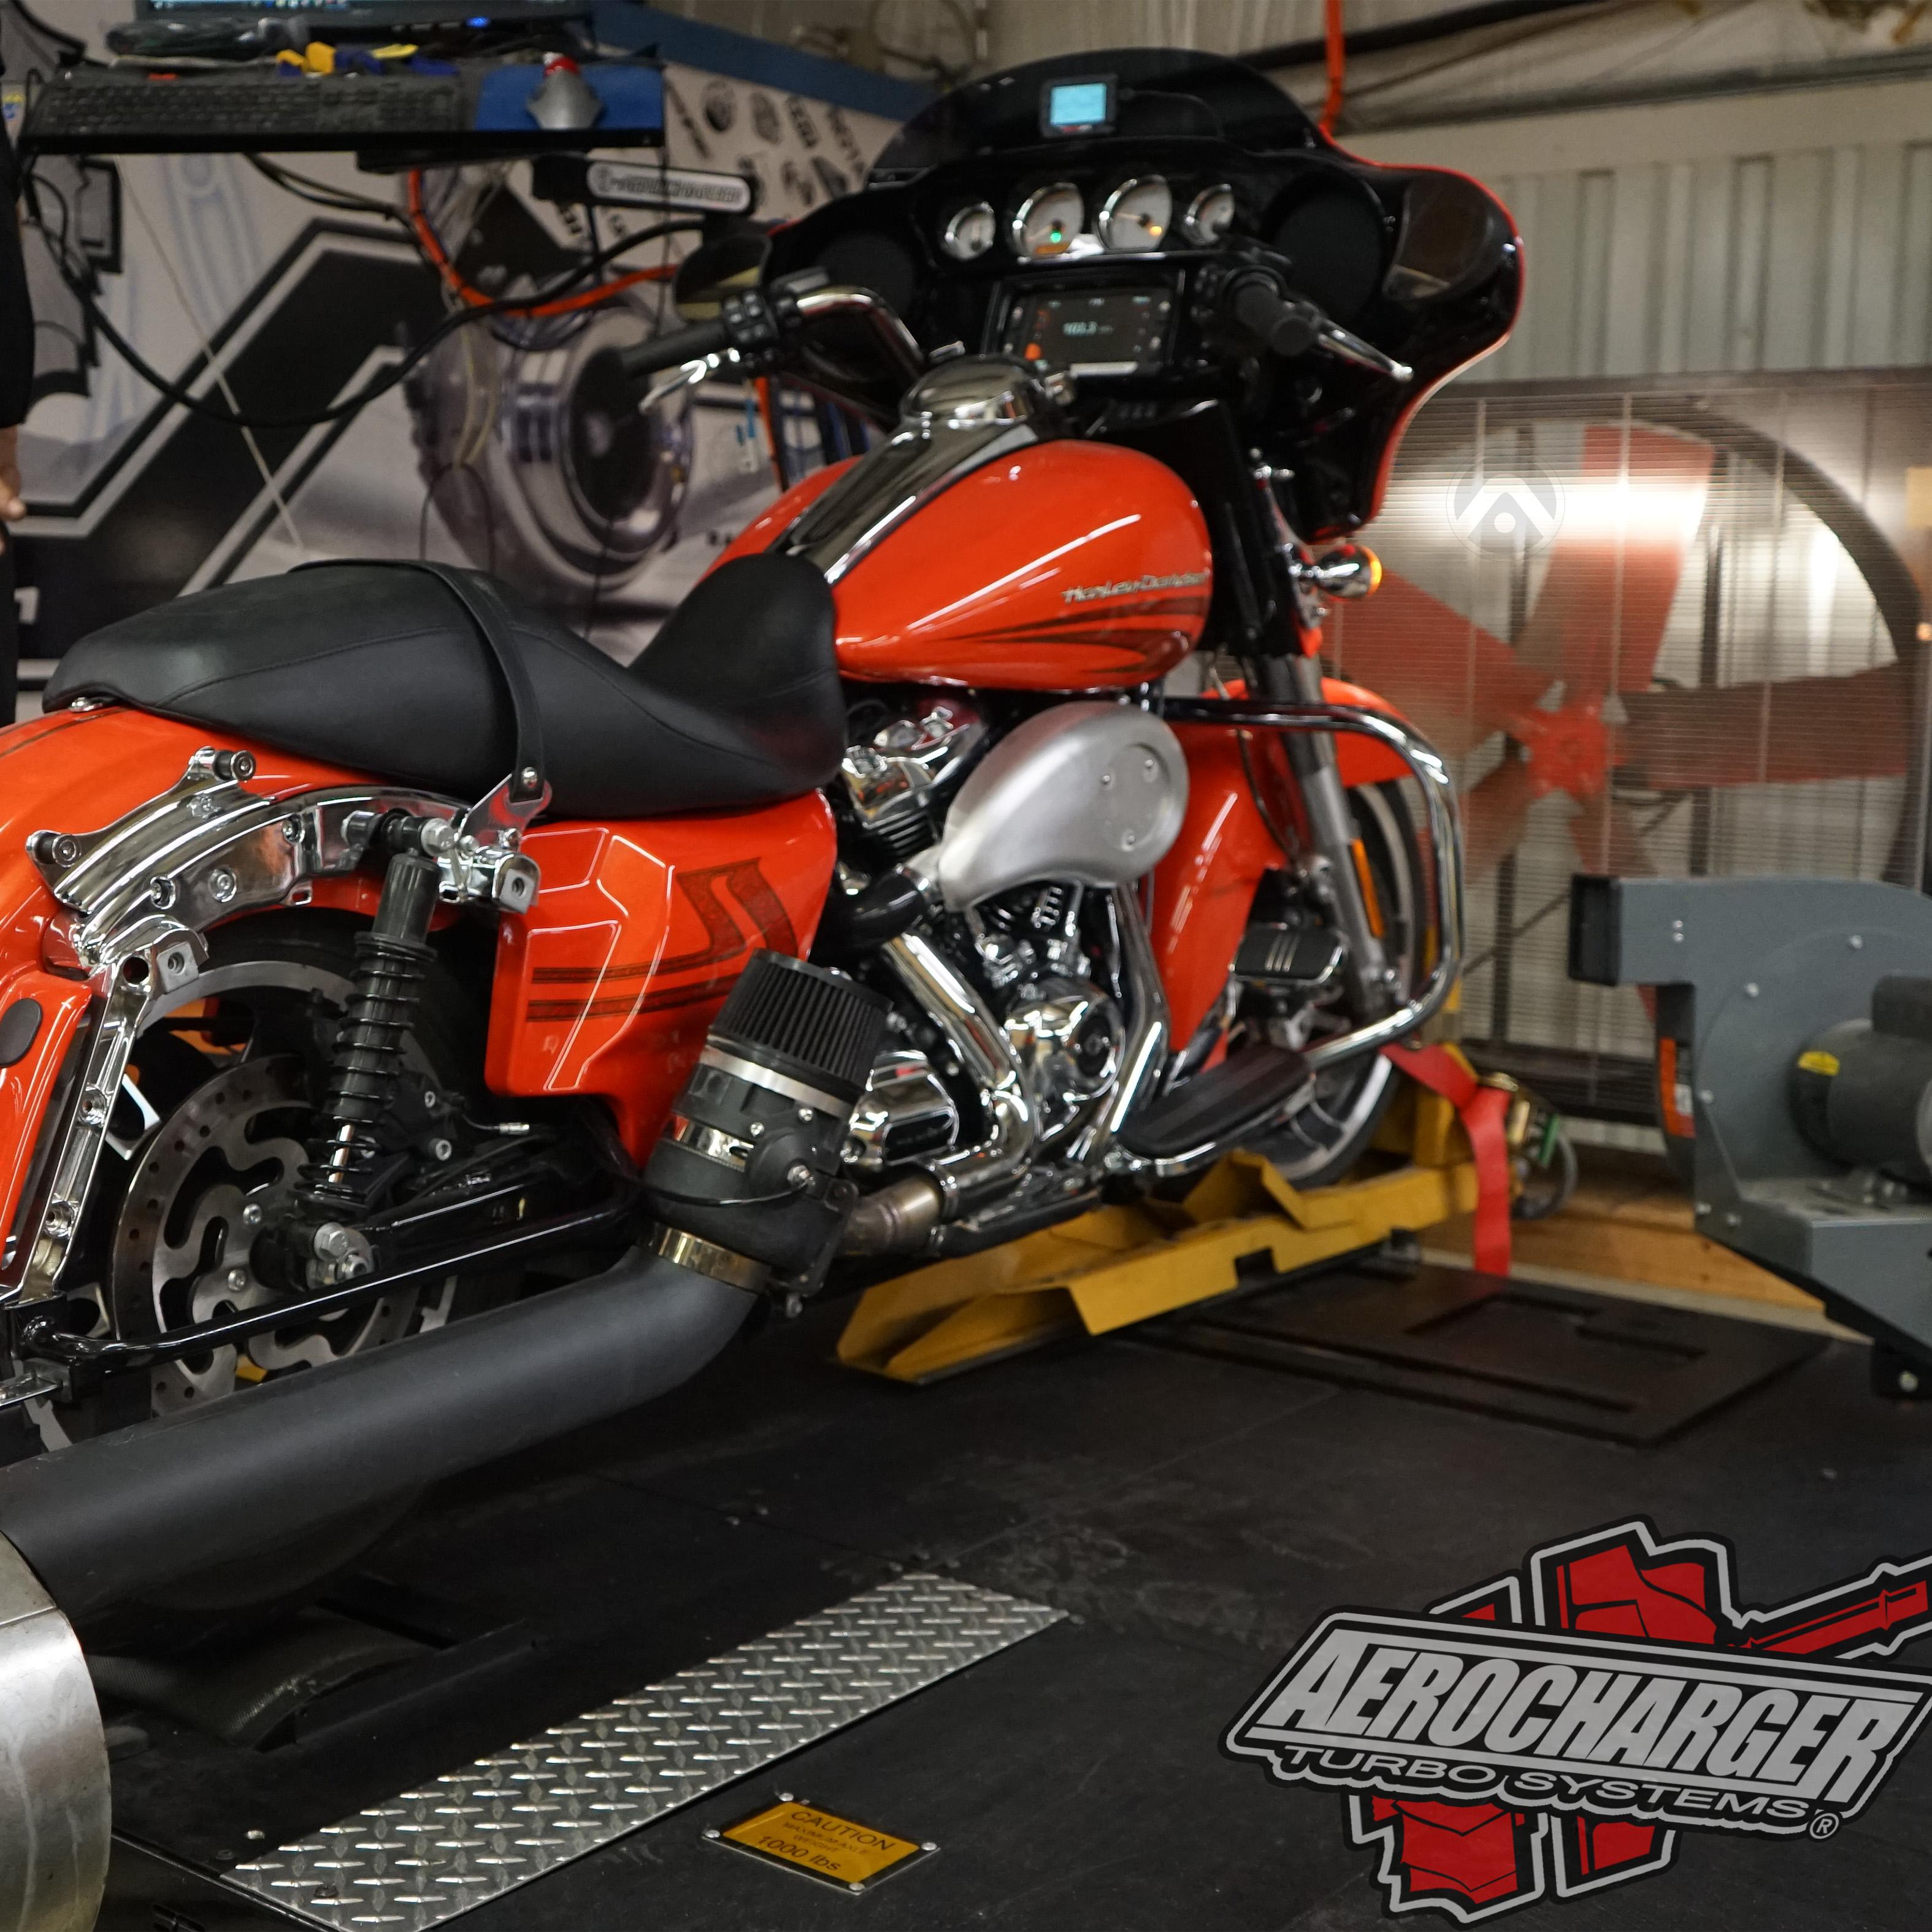 Turbo Harley Reliability